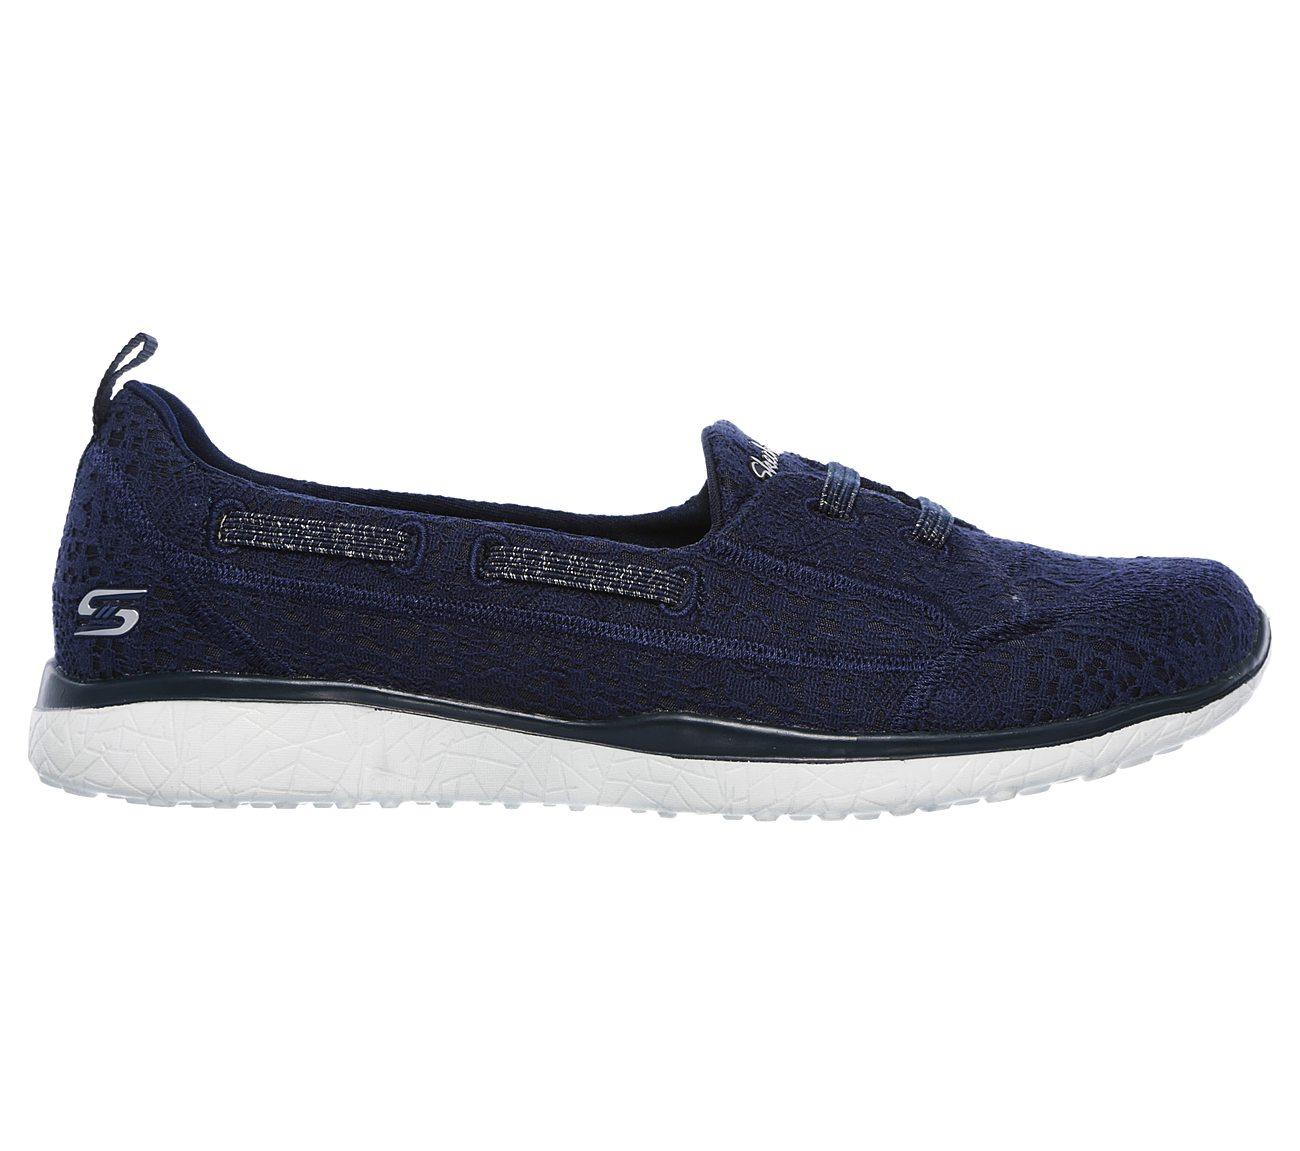 d7c3eb5e47 Buy SKECHERS Microburst - Gentle Gaze Fashion Fit Shoes only £62.00